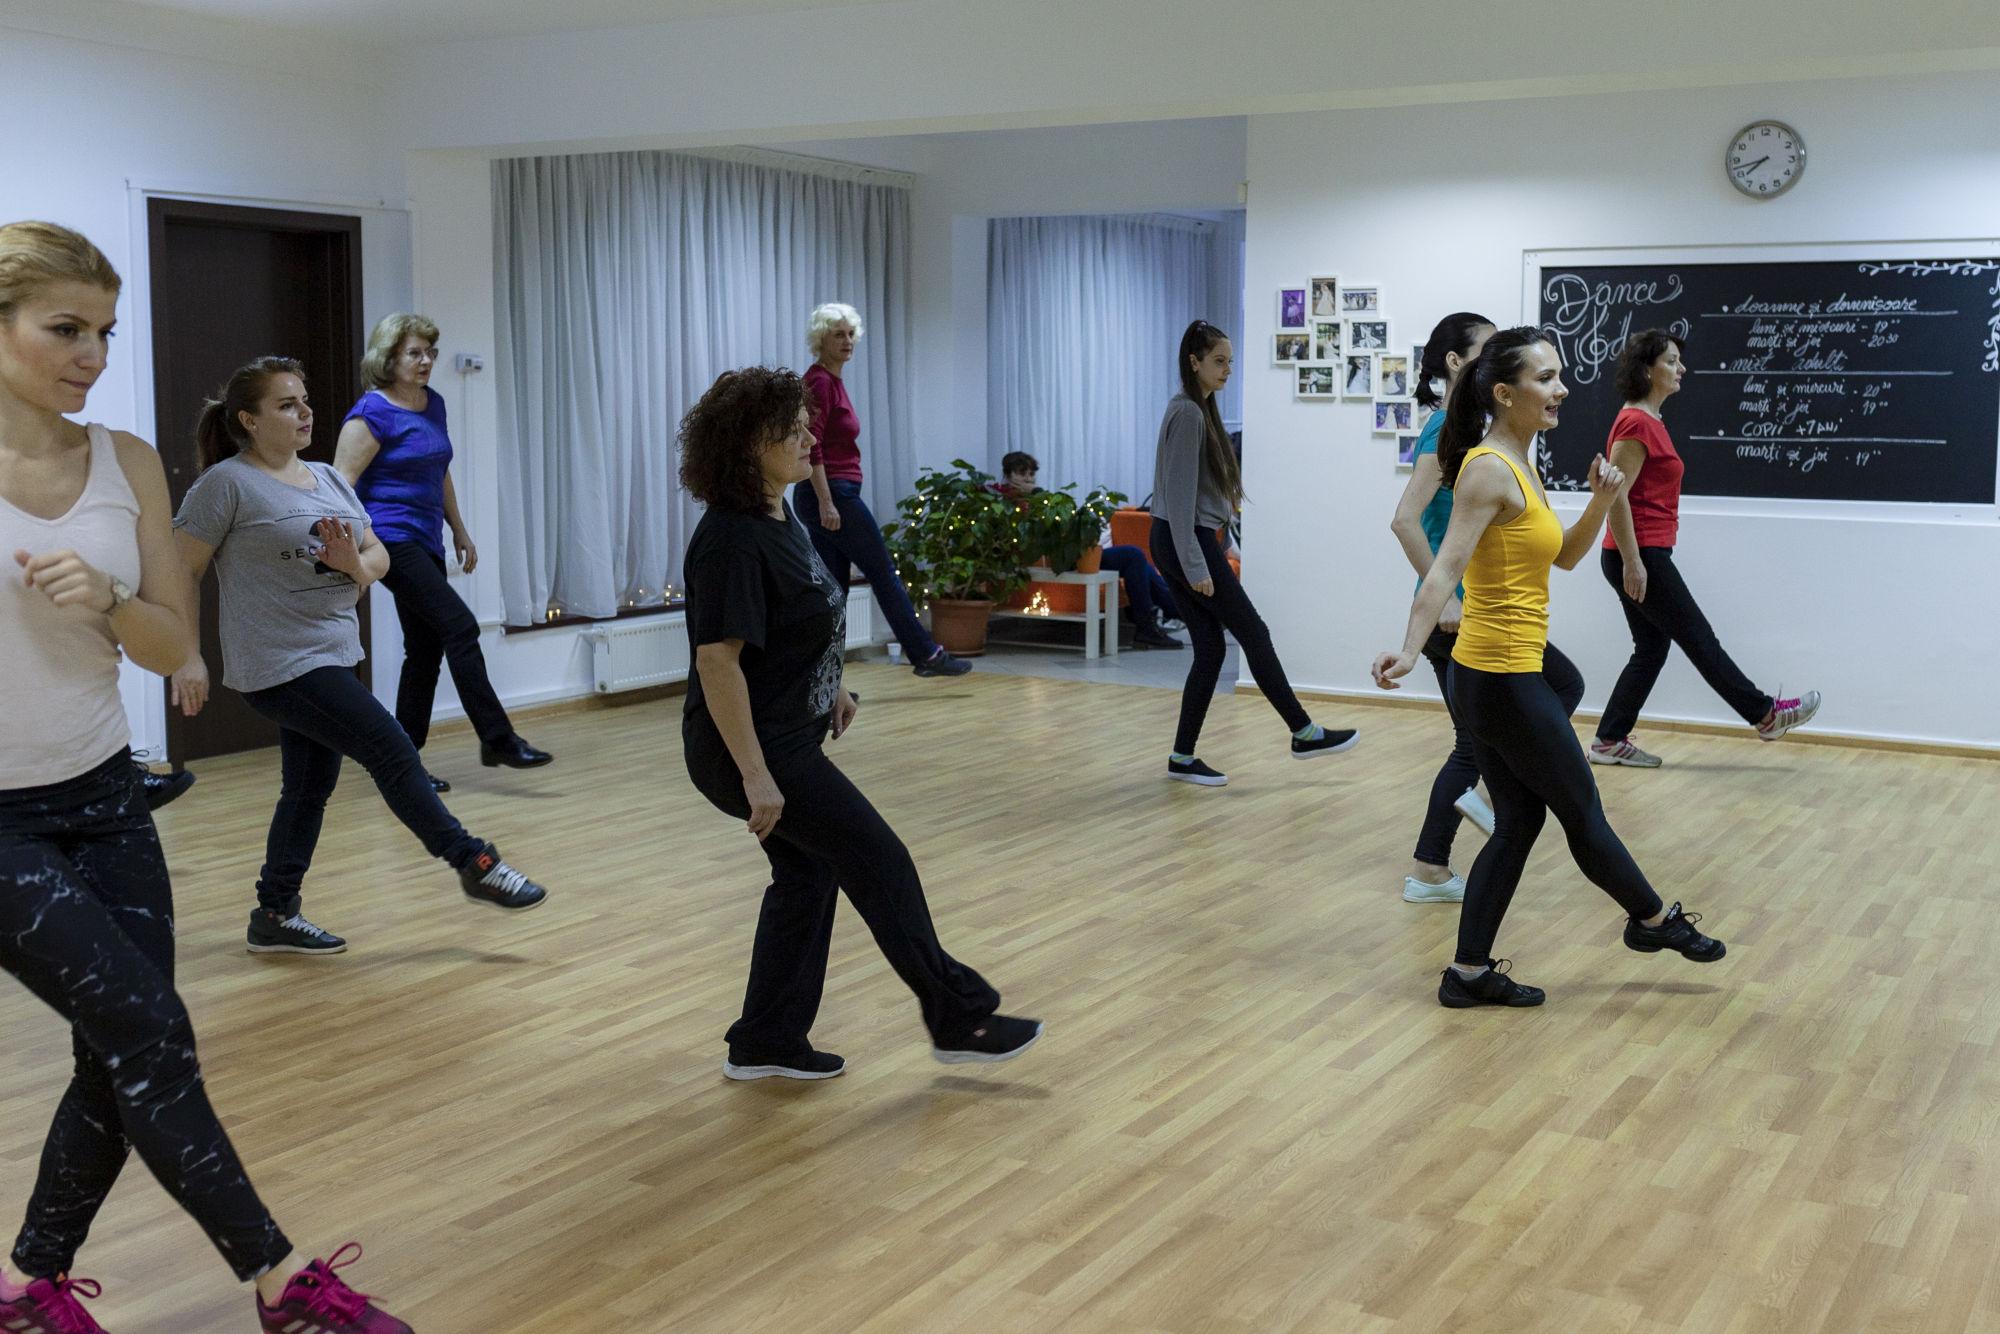 sala de dans Dance Today Bucuresti